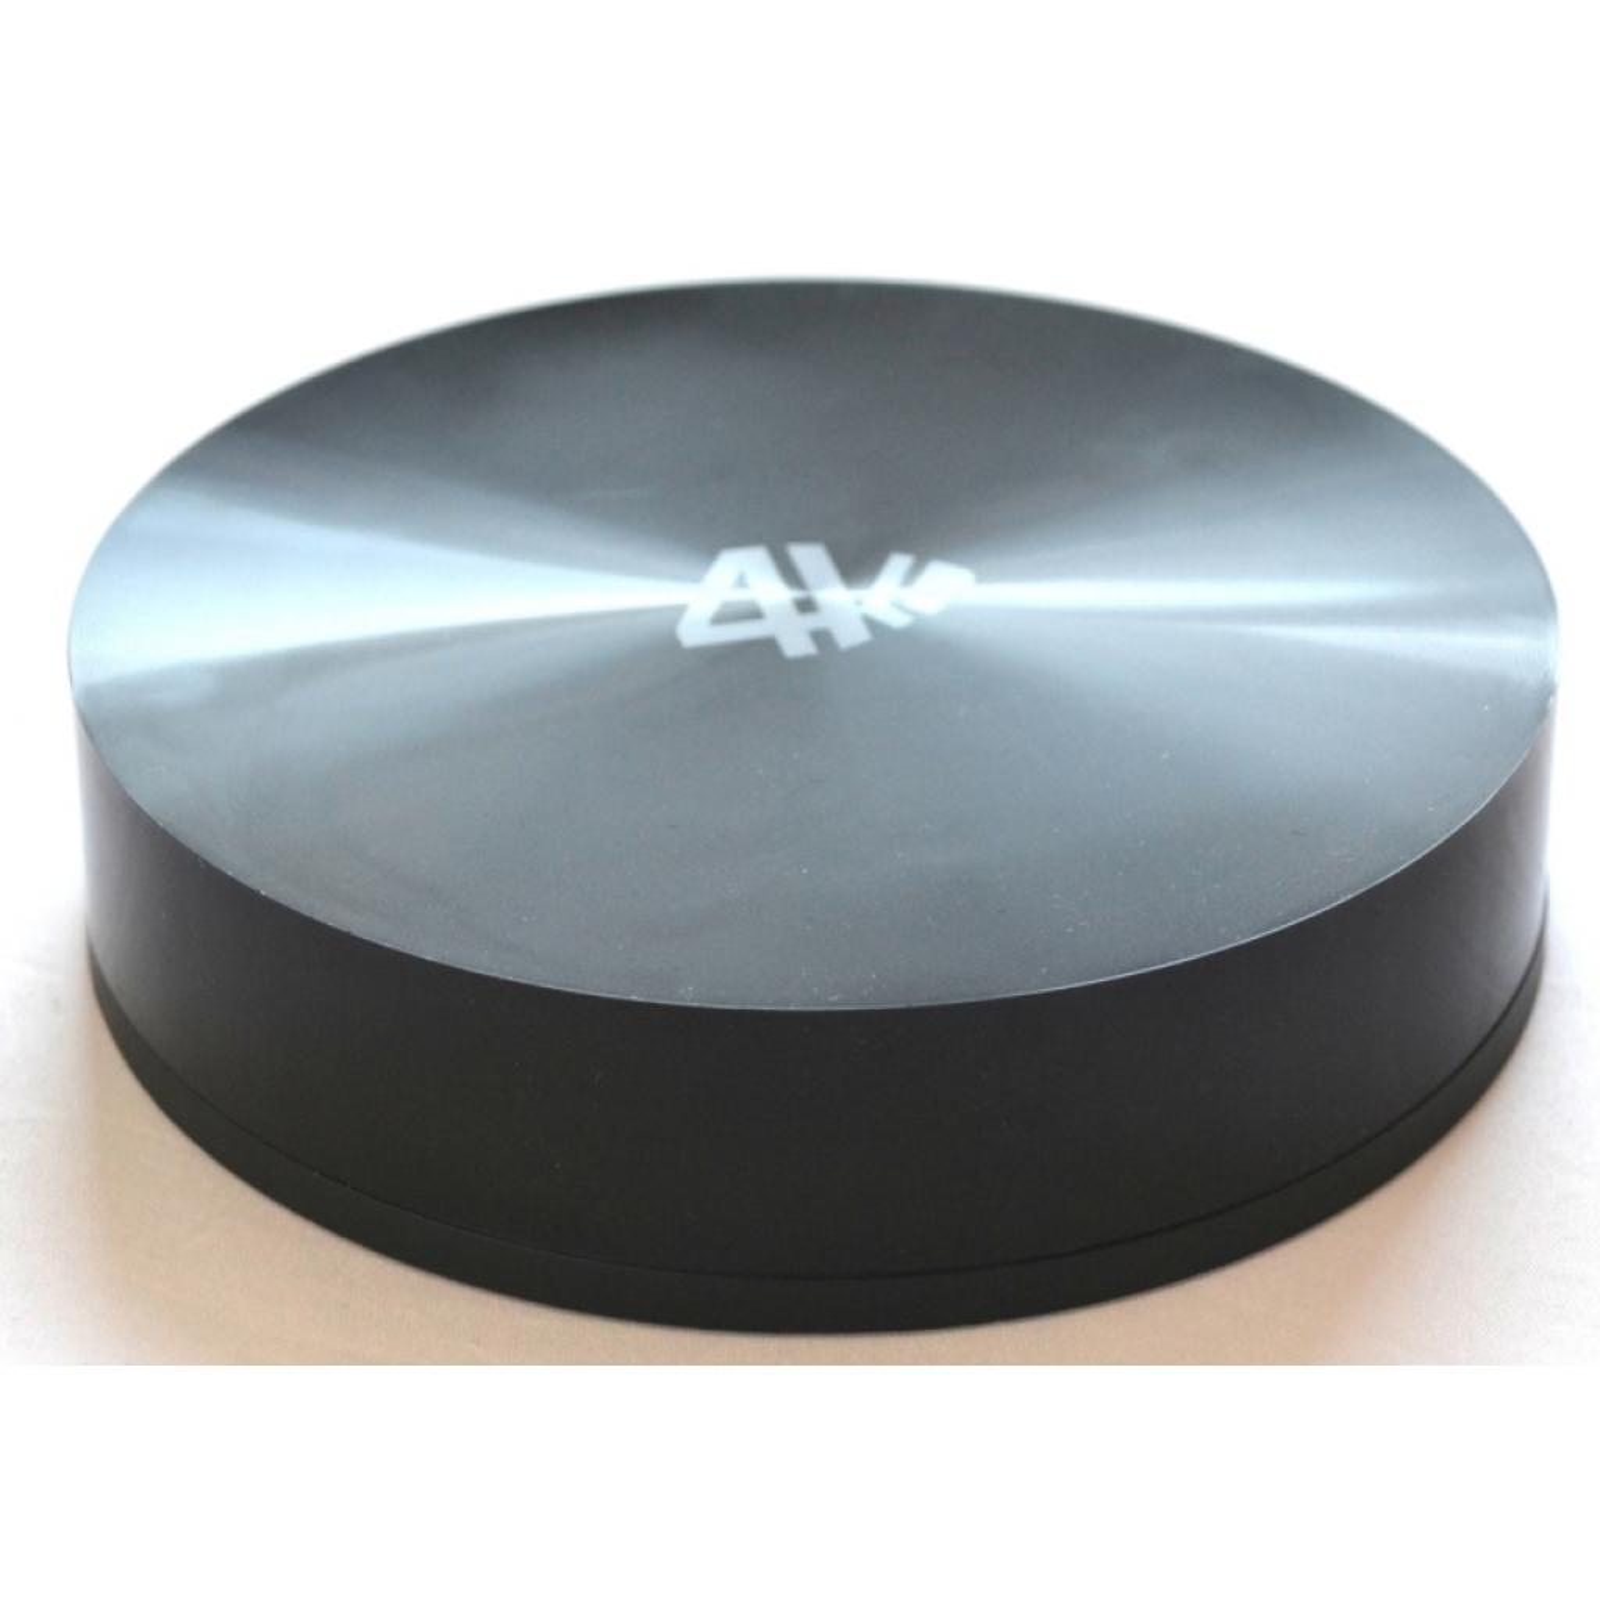 Медиаплеер Alfacore Smart TV Round изображение 3